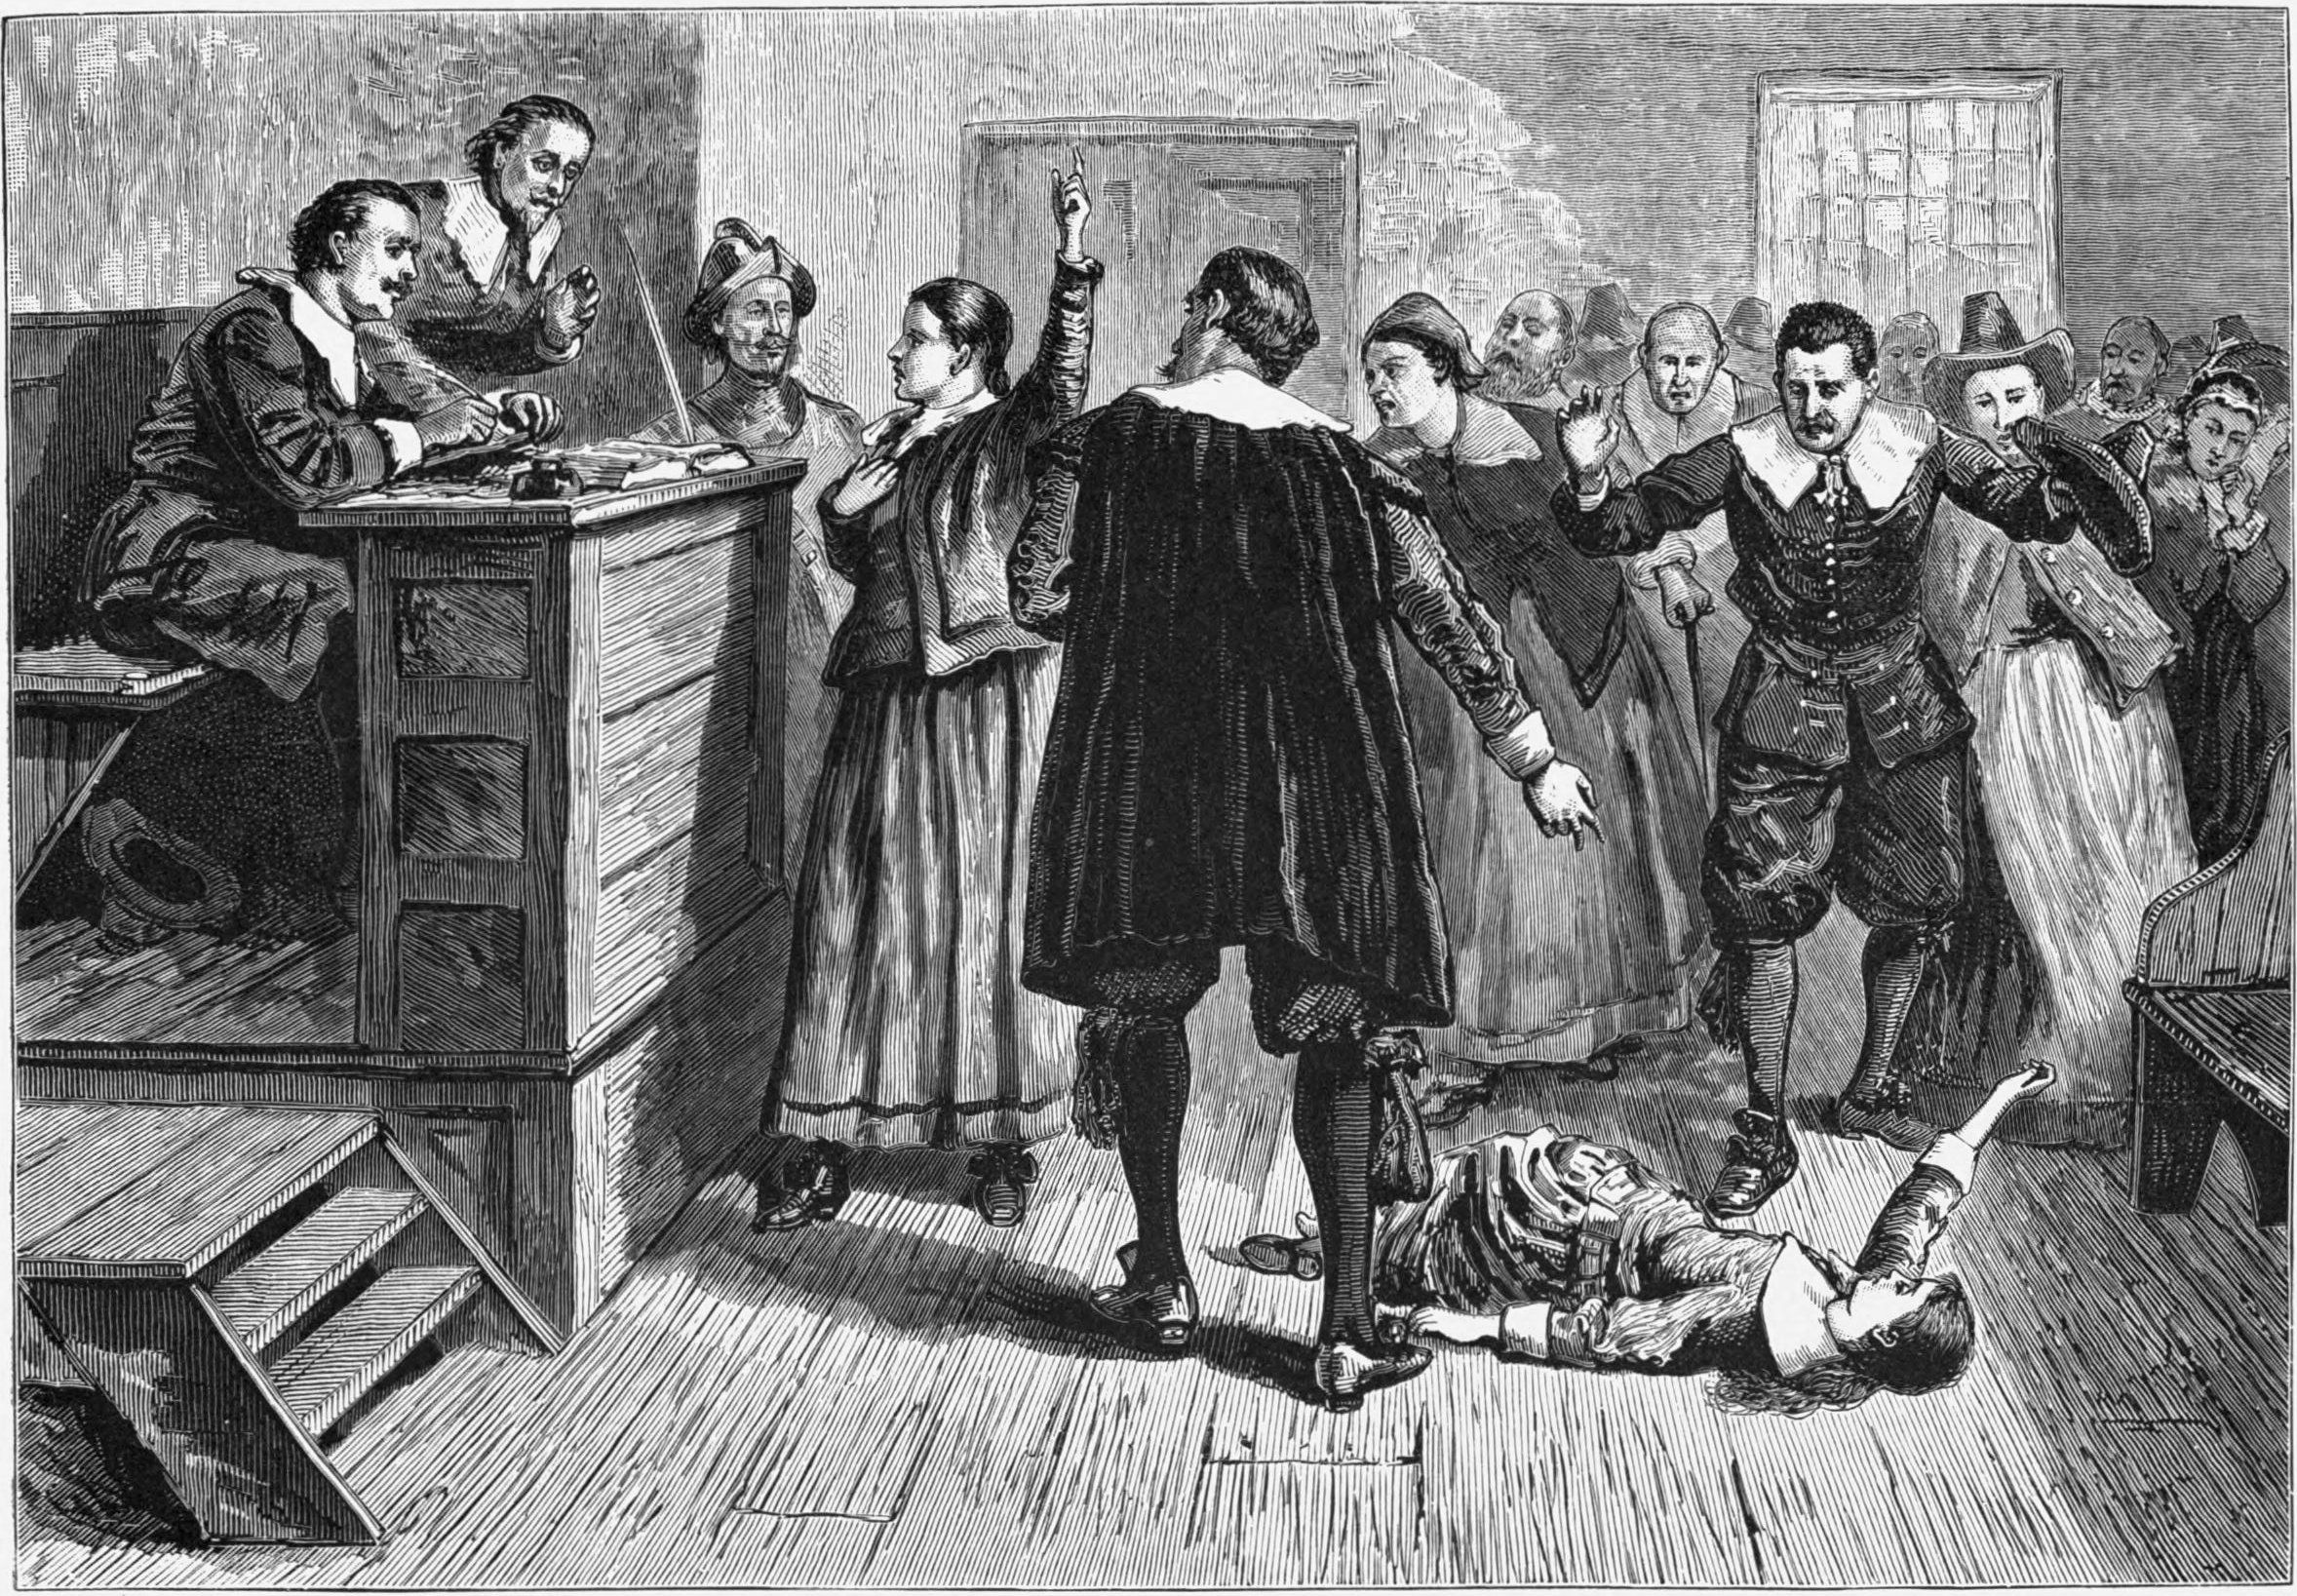 Salem witch trials research paper